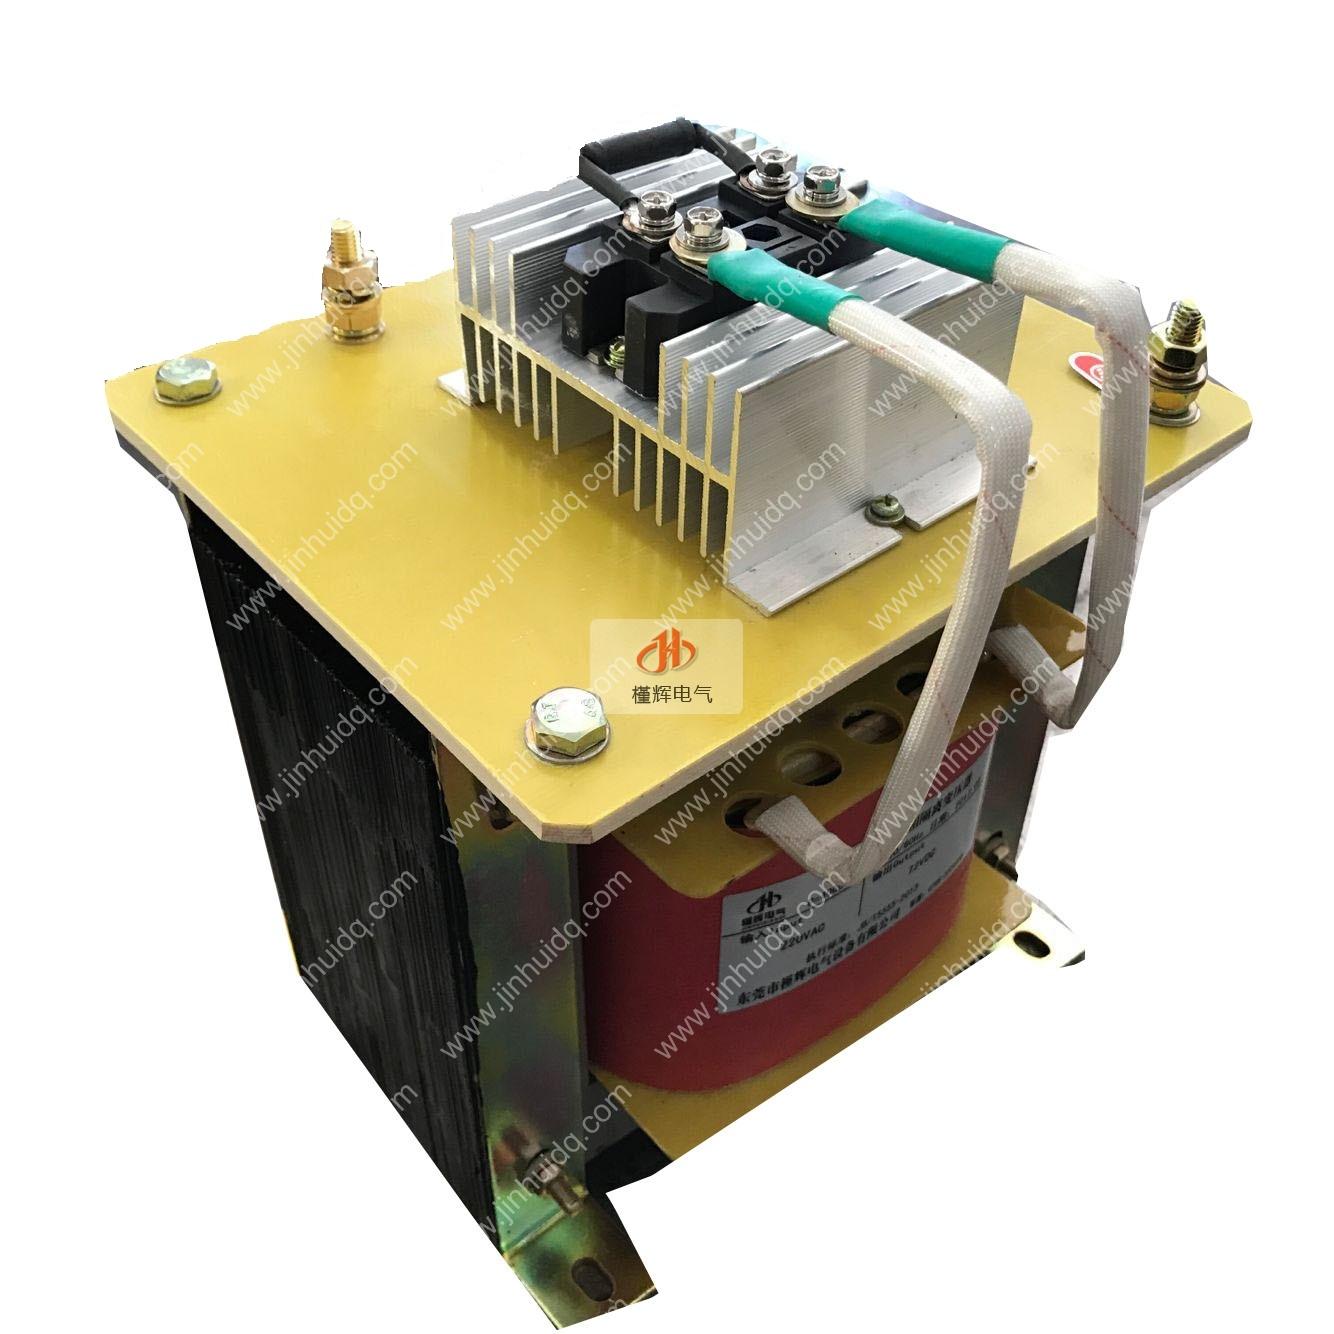 BKZ-2KVA220VAC променлива 24 vdc електрическо монофазна трансформатор ac 220v до вашингтон 24V2KW